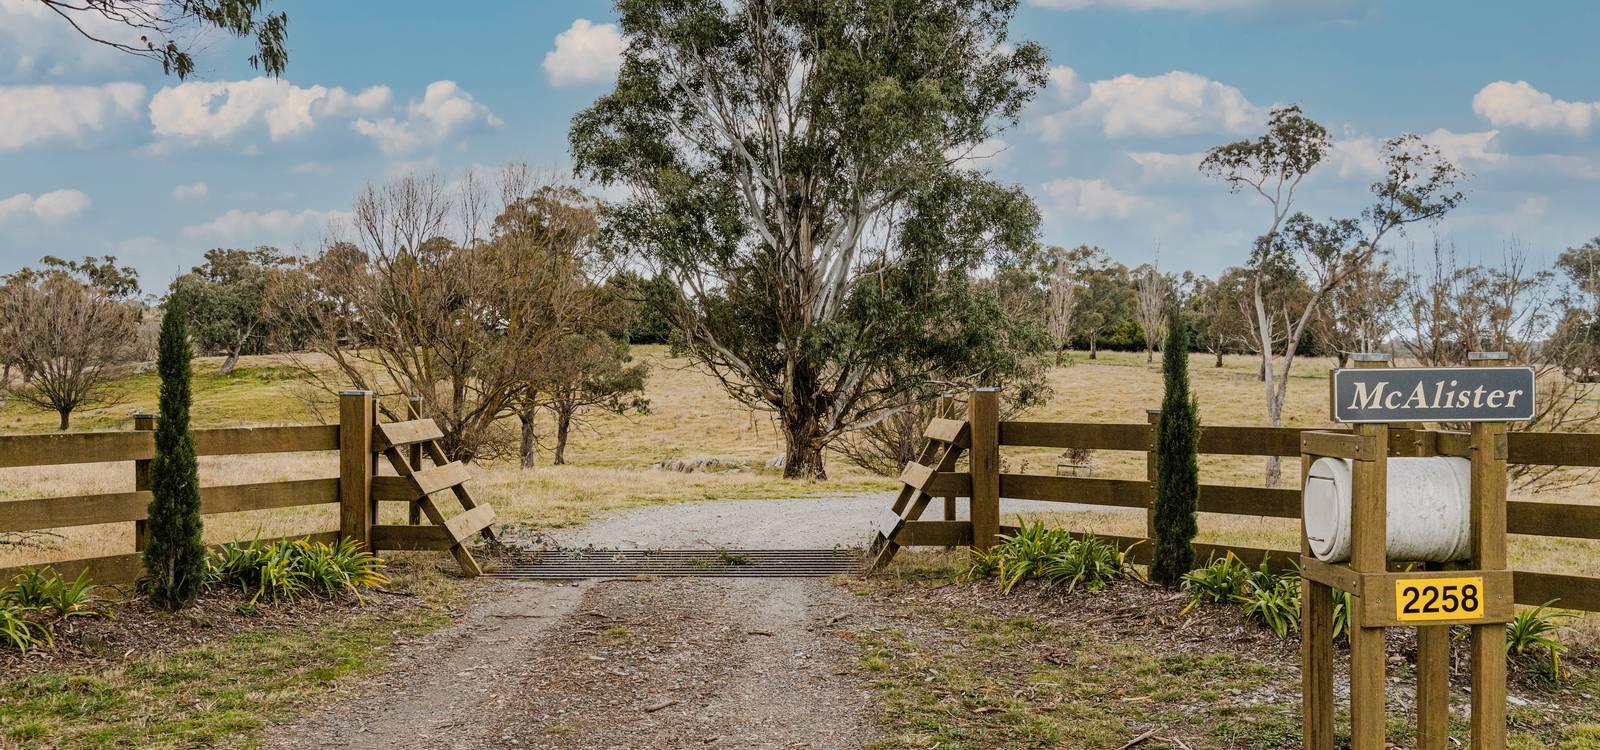 2258 Woodhouselee Road, GOULBURN, NSW 2580 - photo 1